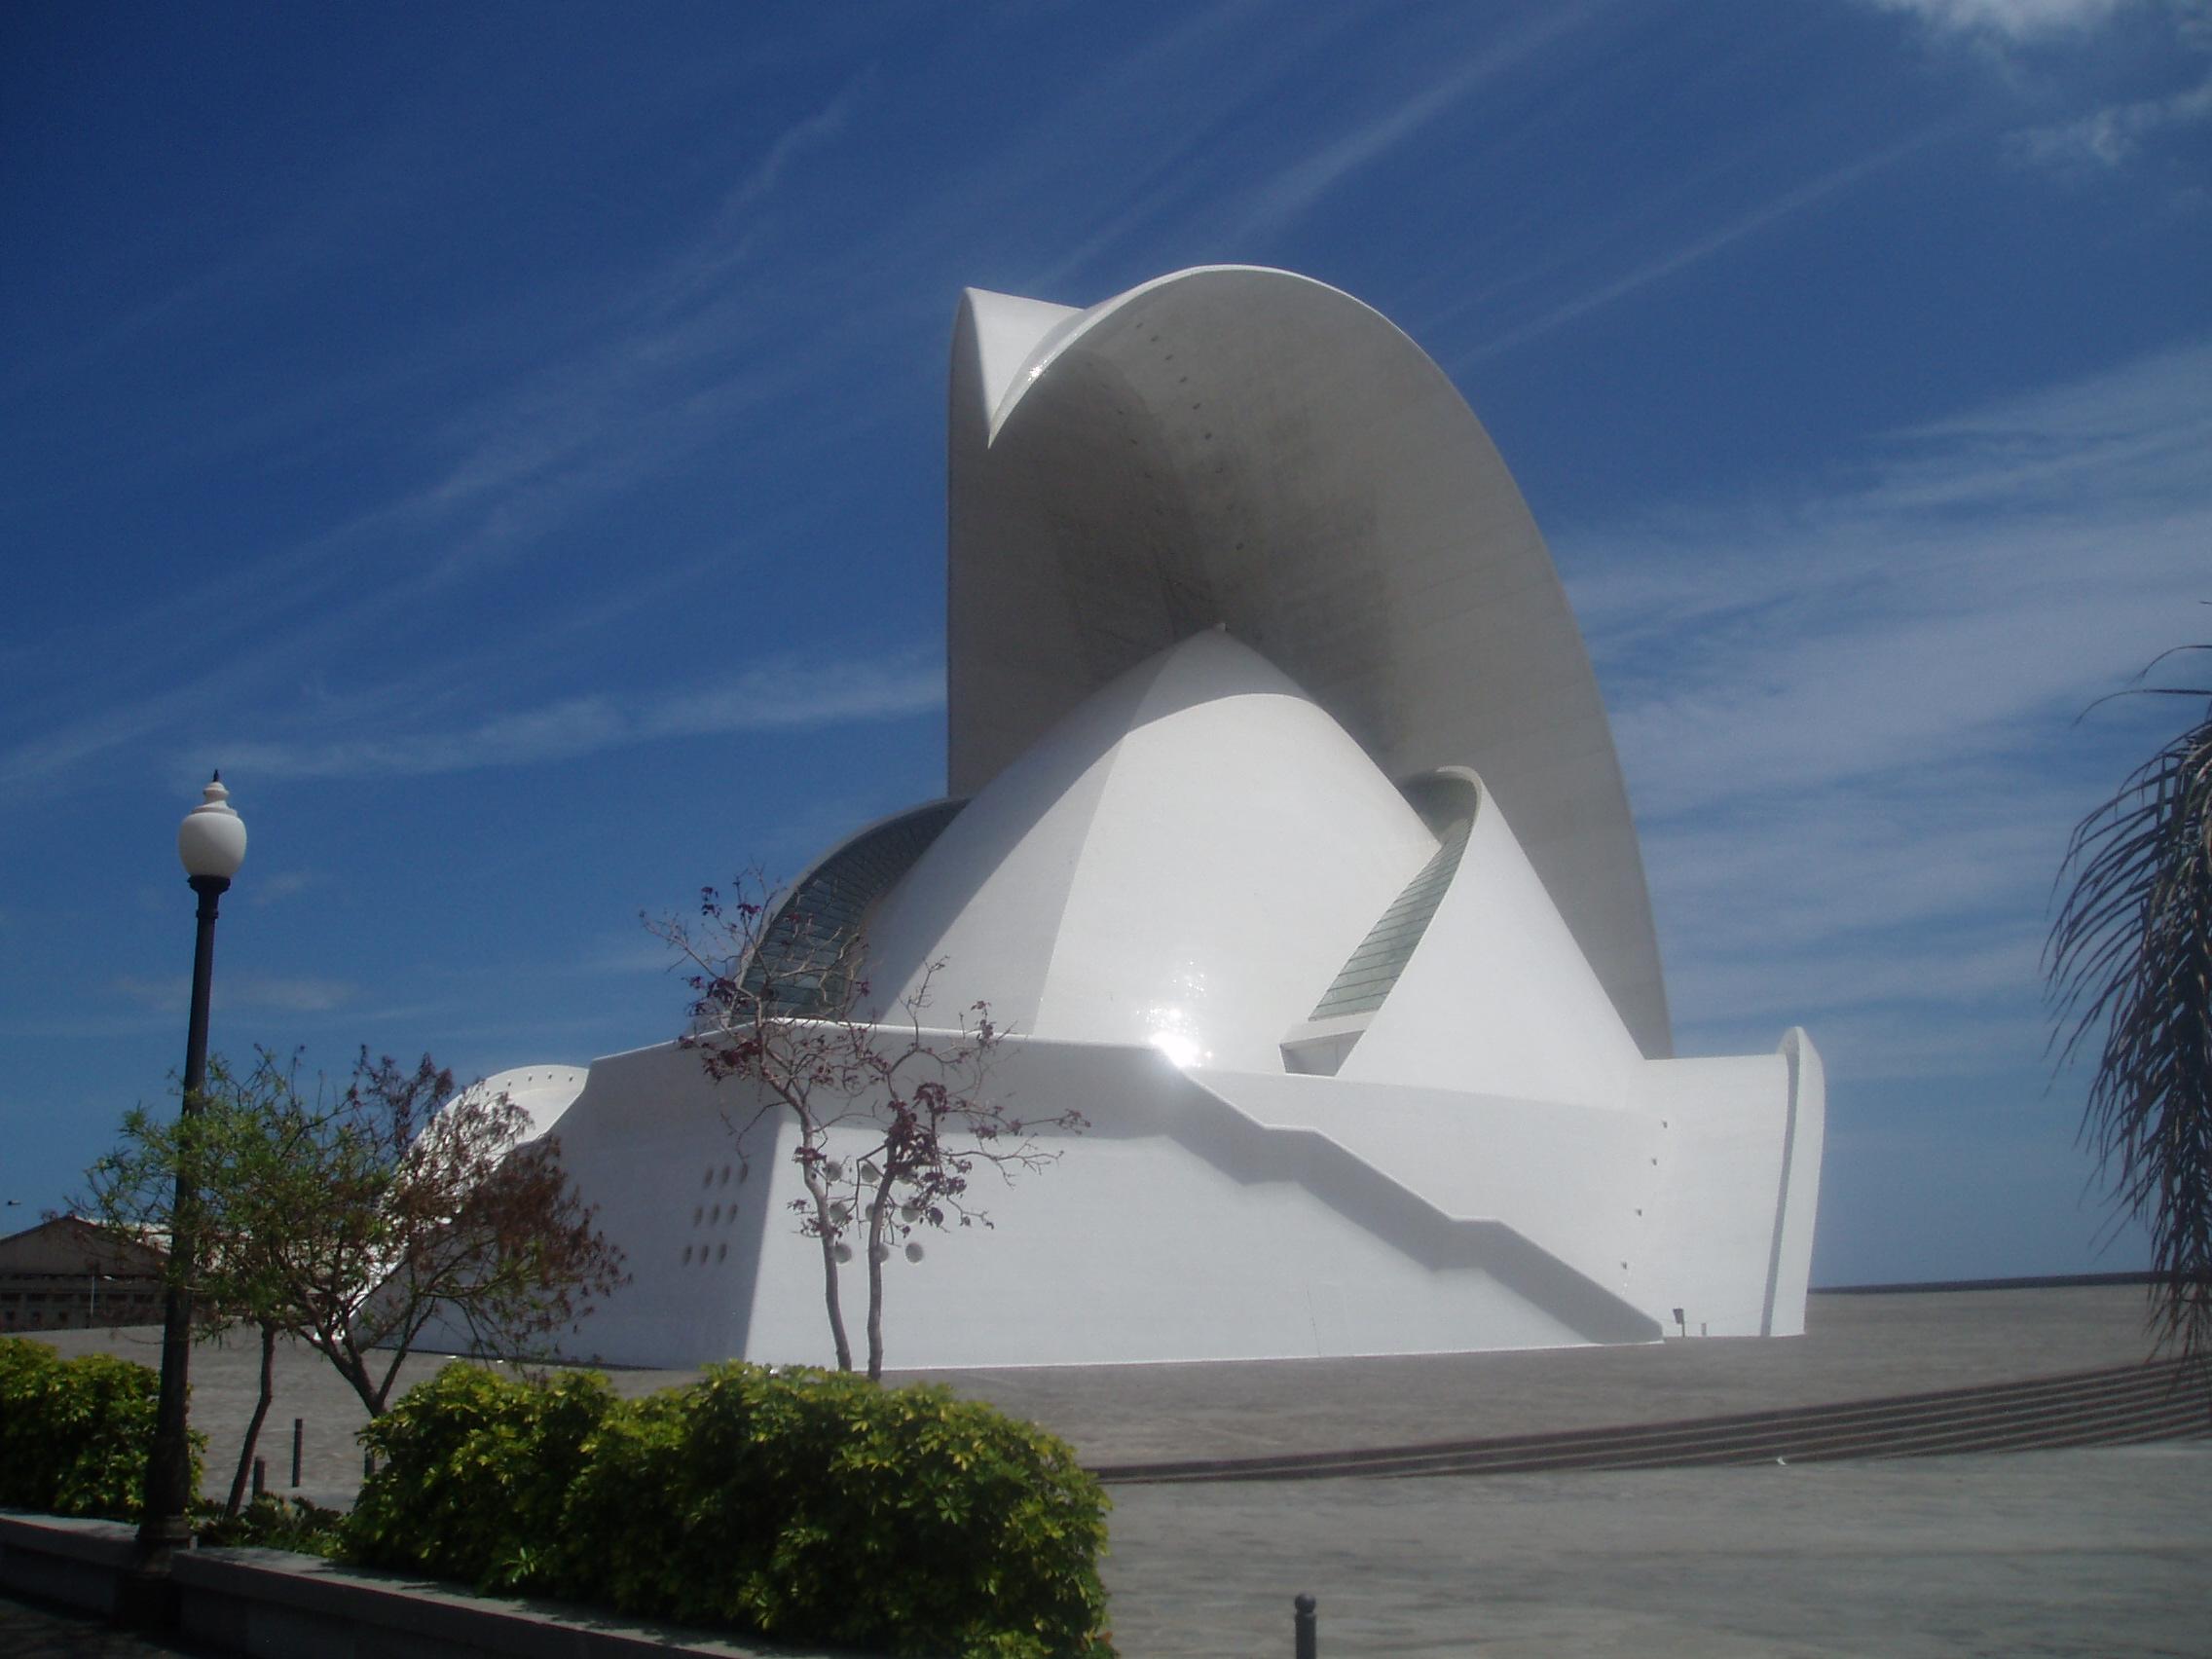 Auditorio de Tenerife 013.JPG